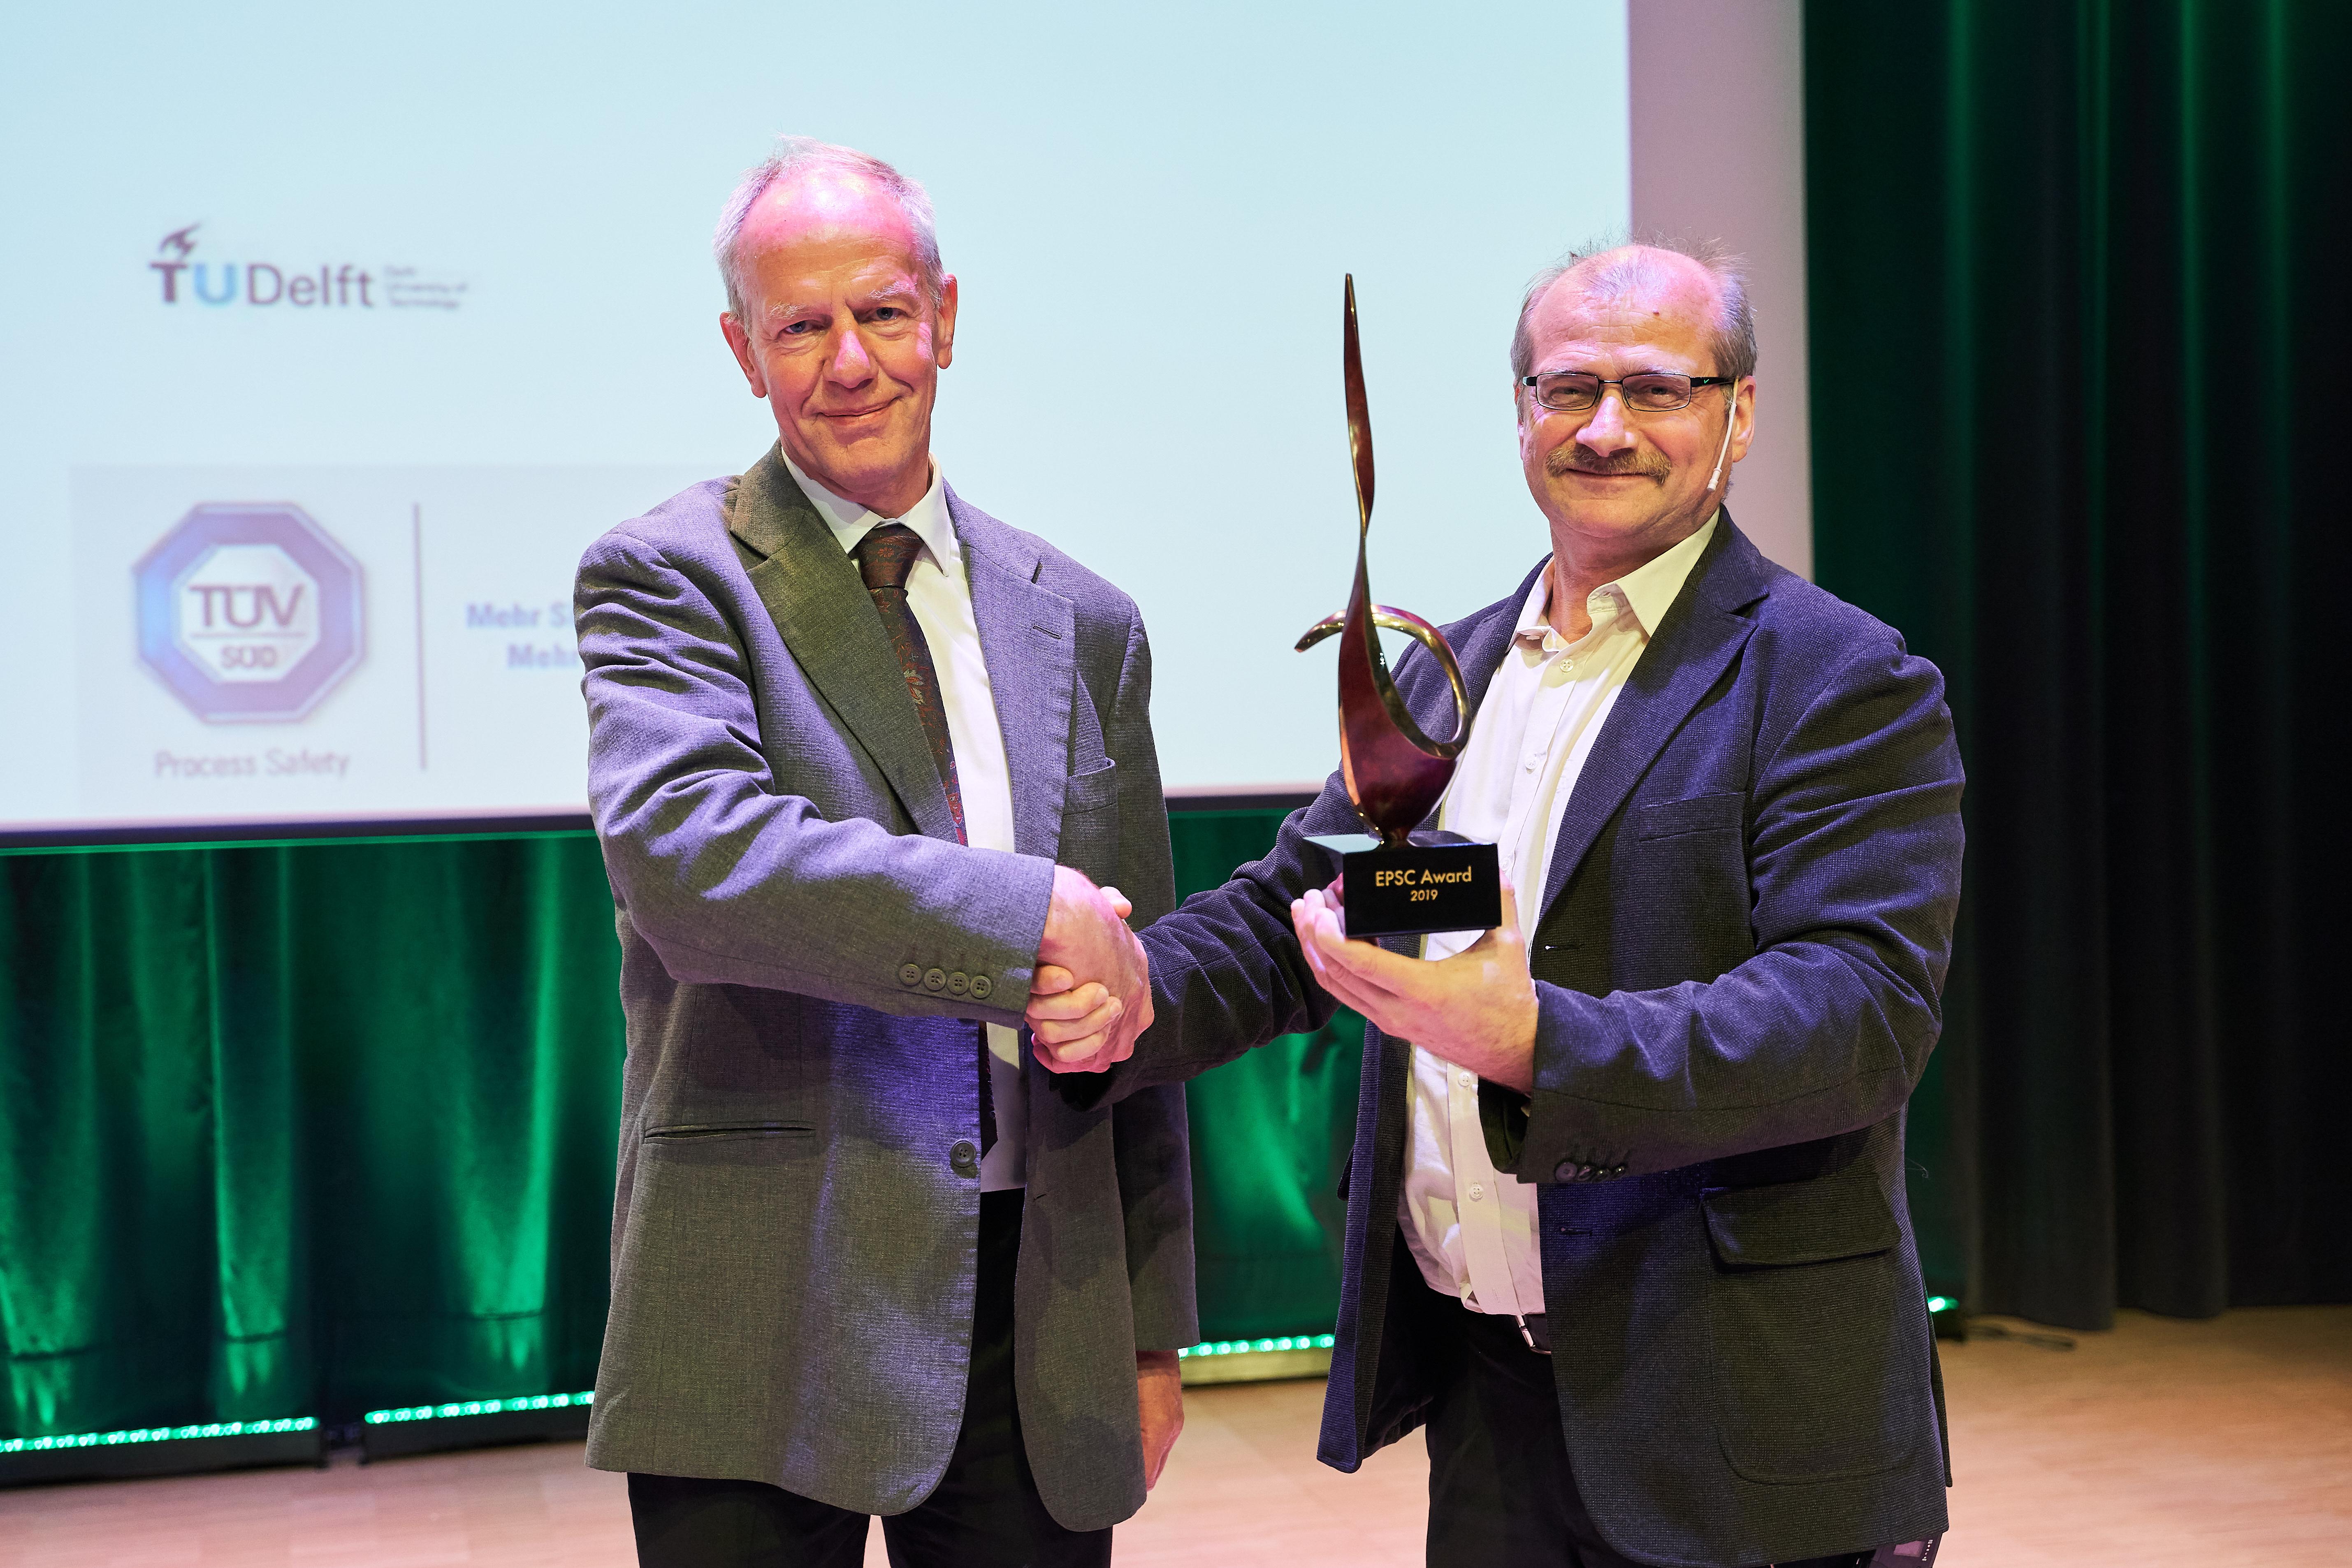 Dr. Kees van Wingerden menerima Penghargaan EPSC 2019 dalam International Symposium on Loss Prevention and Safety Promotion ke-16.